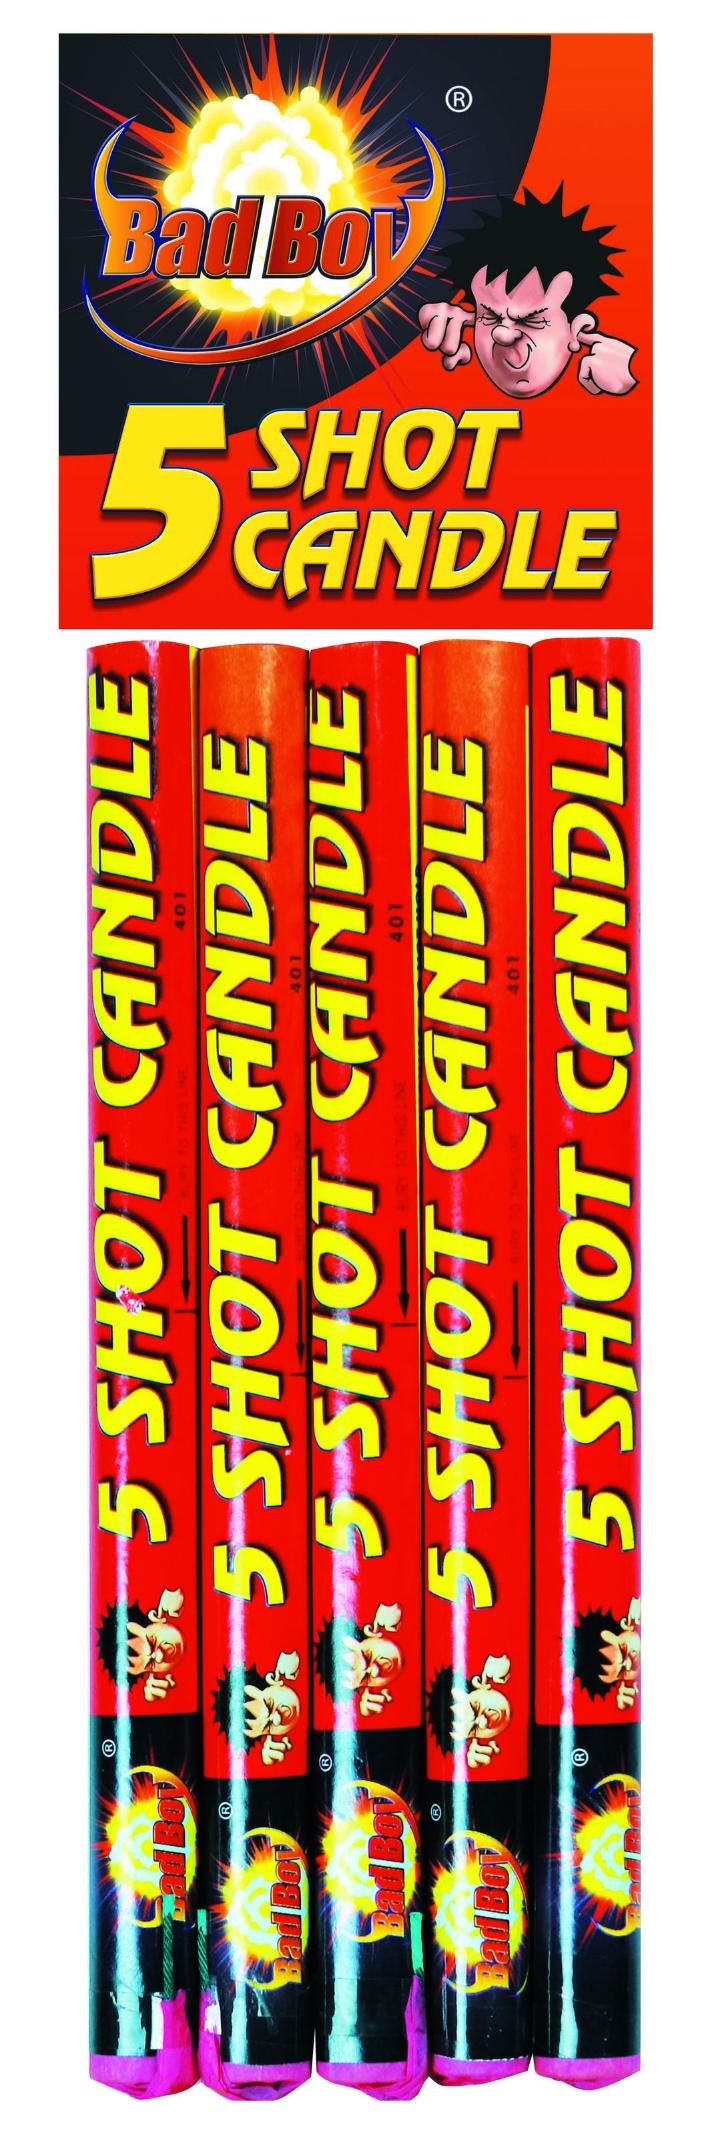 5 Shot Candle 5pk - RRP £7.00